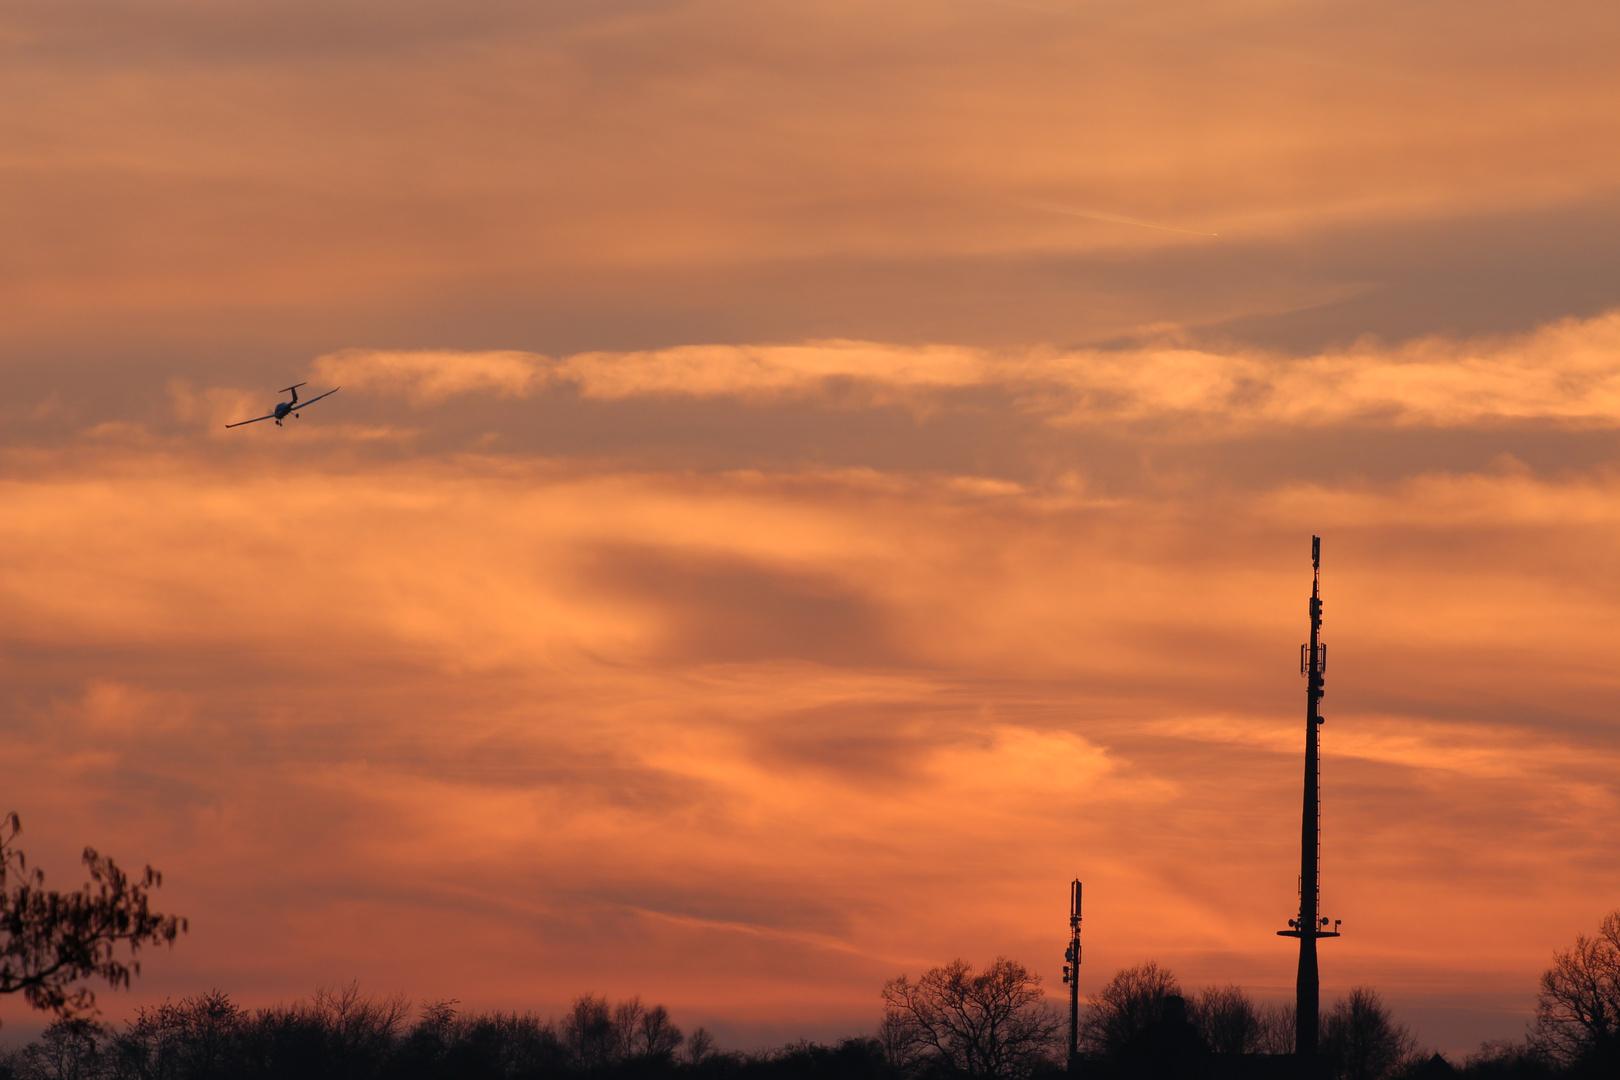 Sonnenuntergang mit Turm